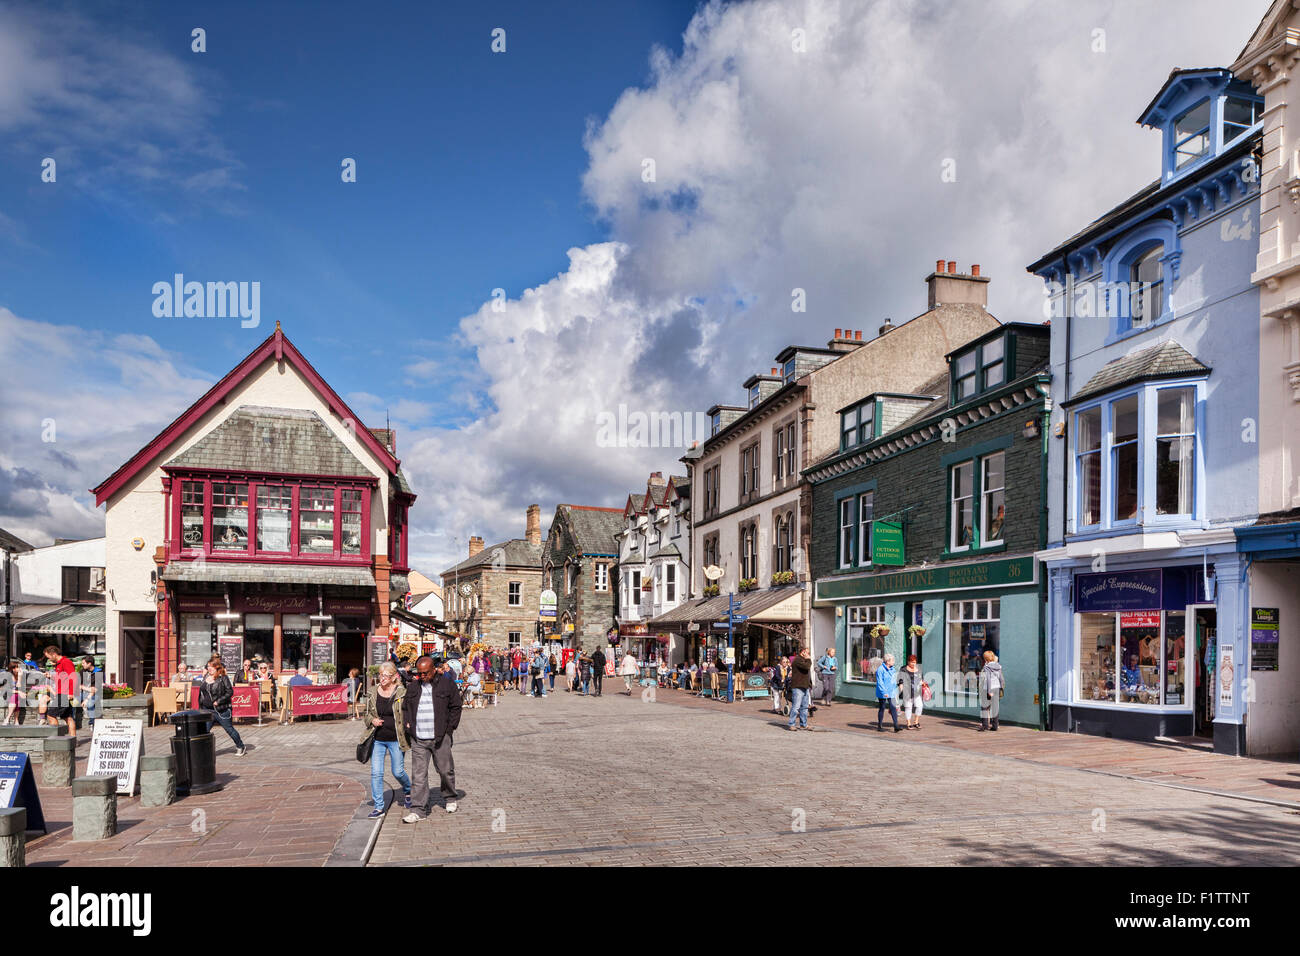 Pedestrian shopping area in the centre of Keswick in Cumbria, UK. - Stock Image